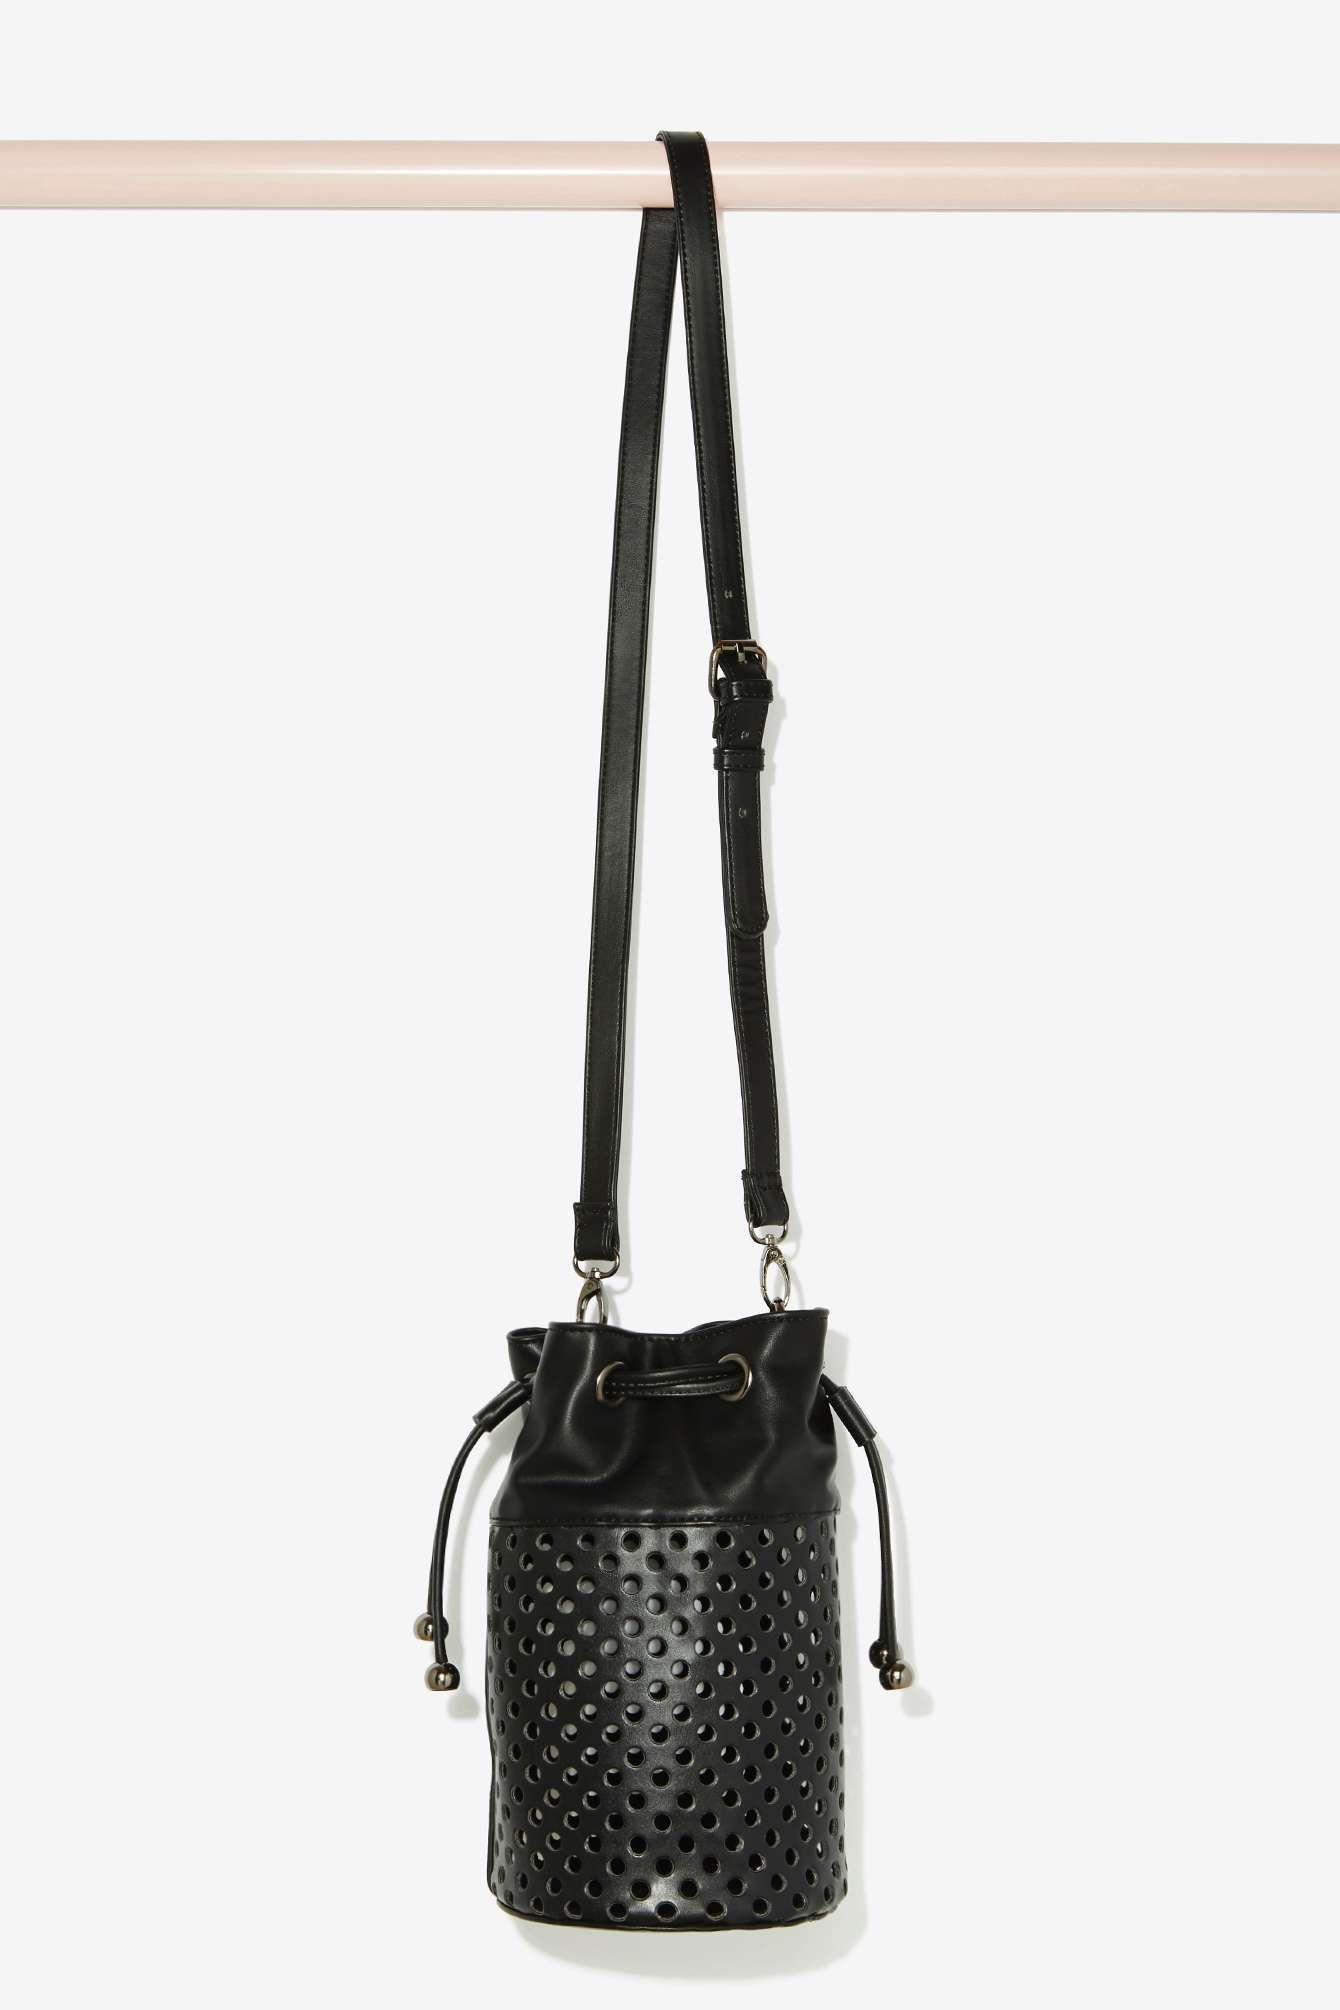 5f7de6982d6c Nasty Gal x Nila Anthony Tila Perforated Bucket Bag